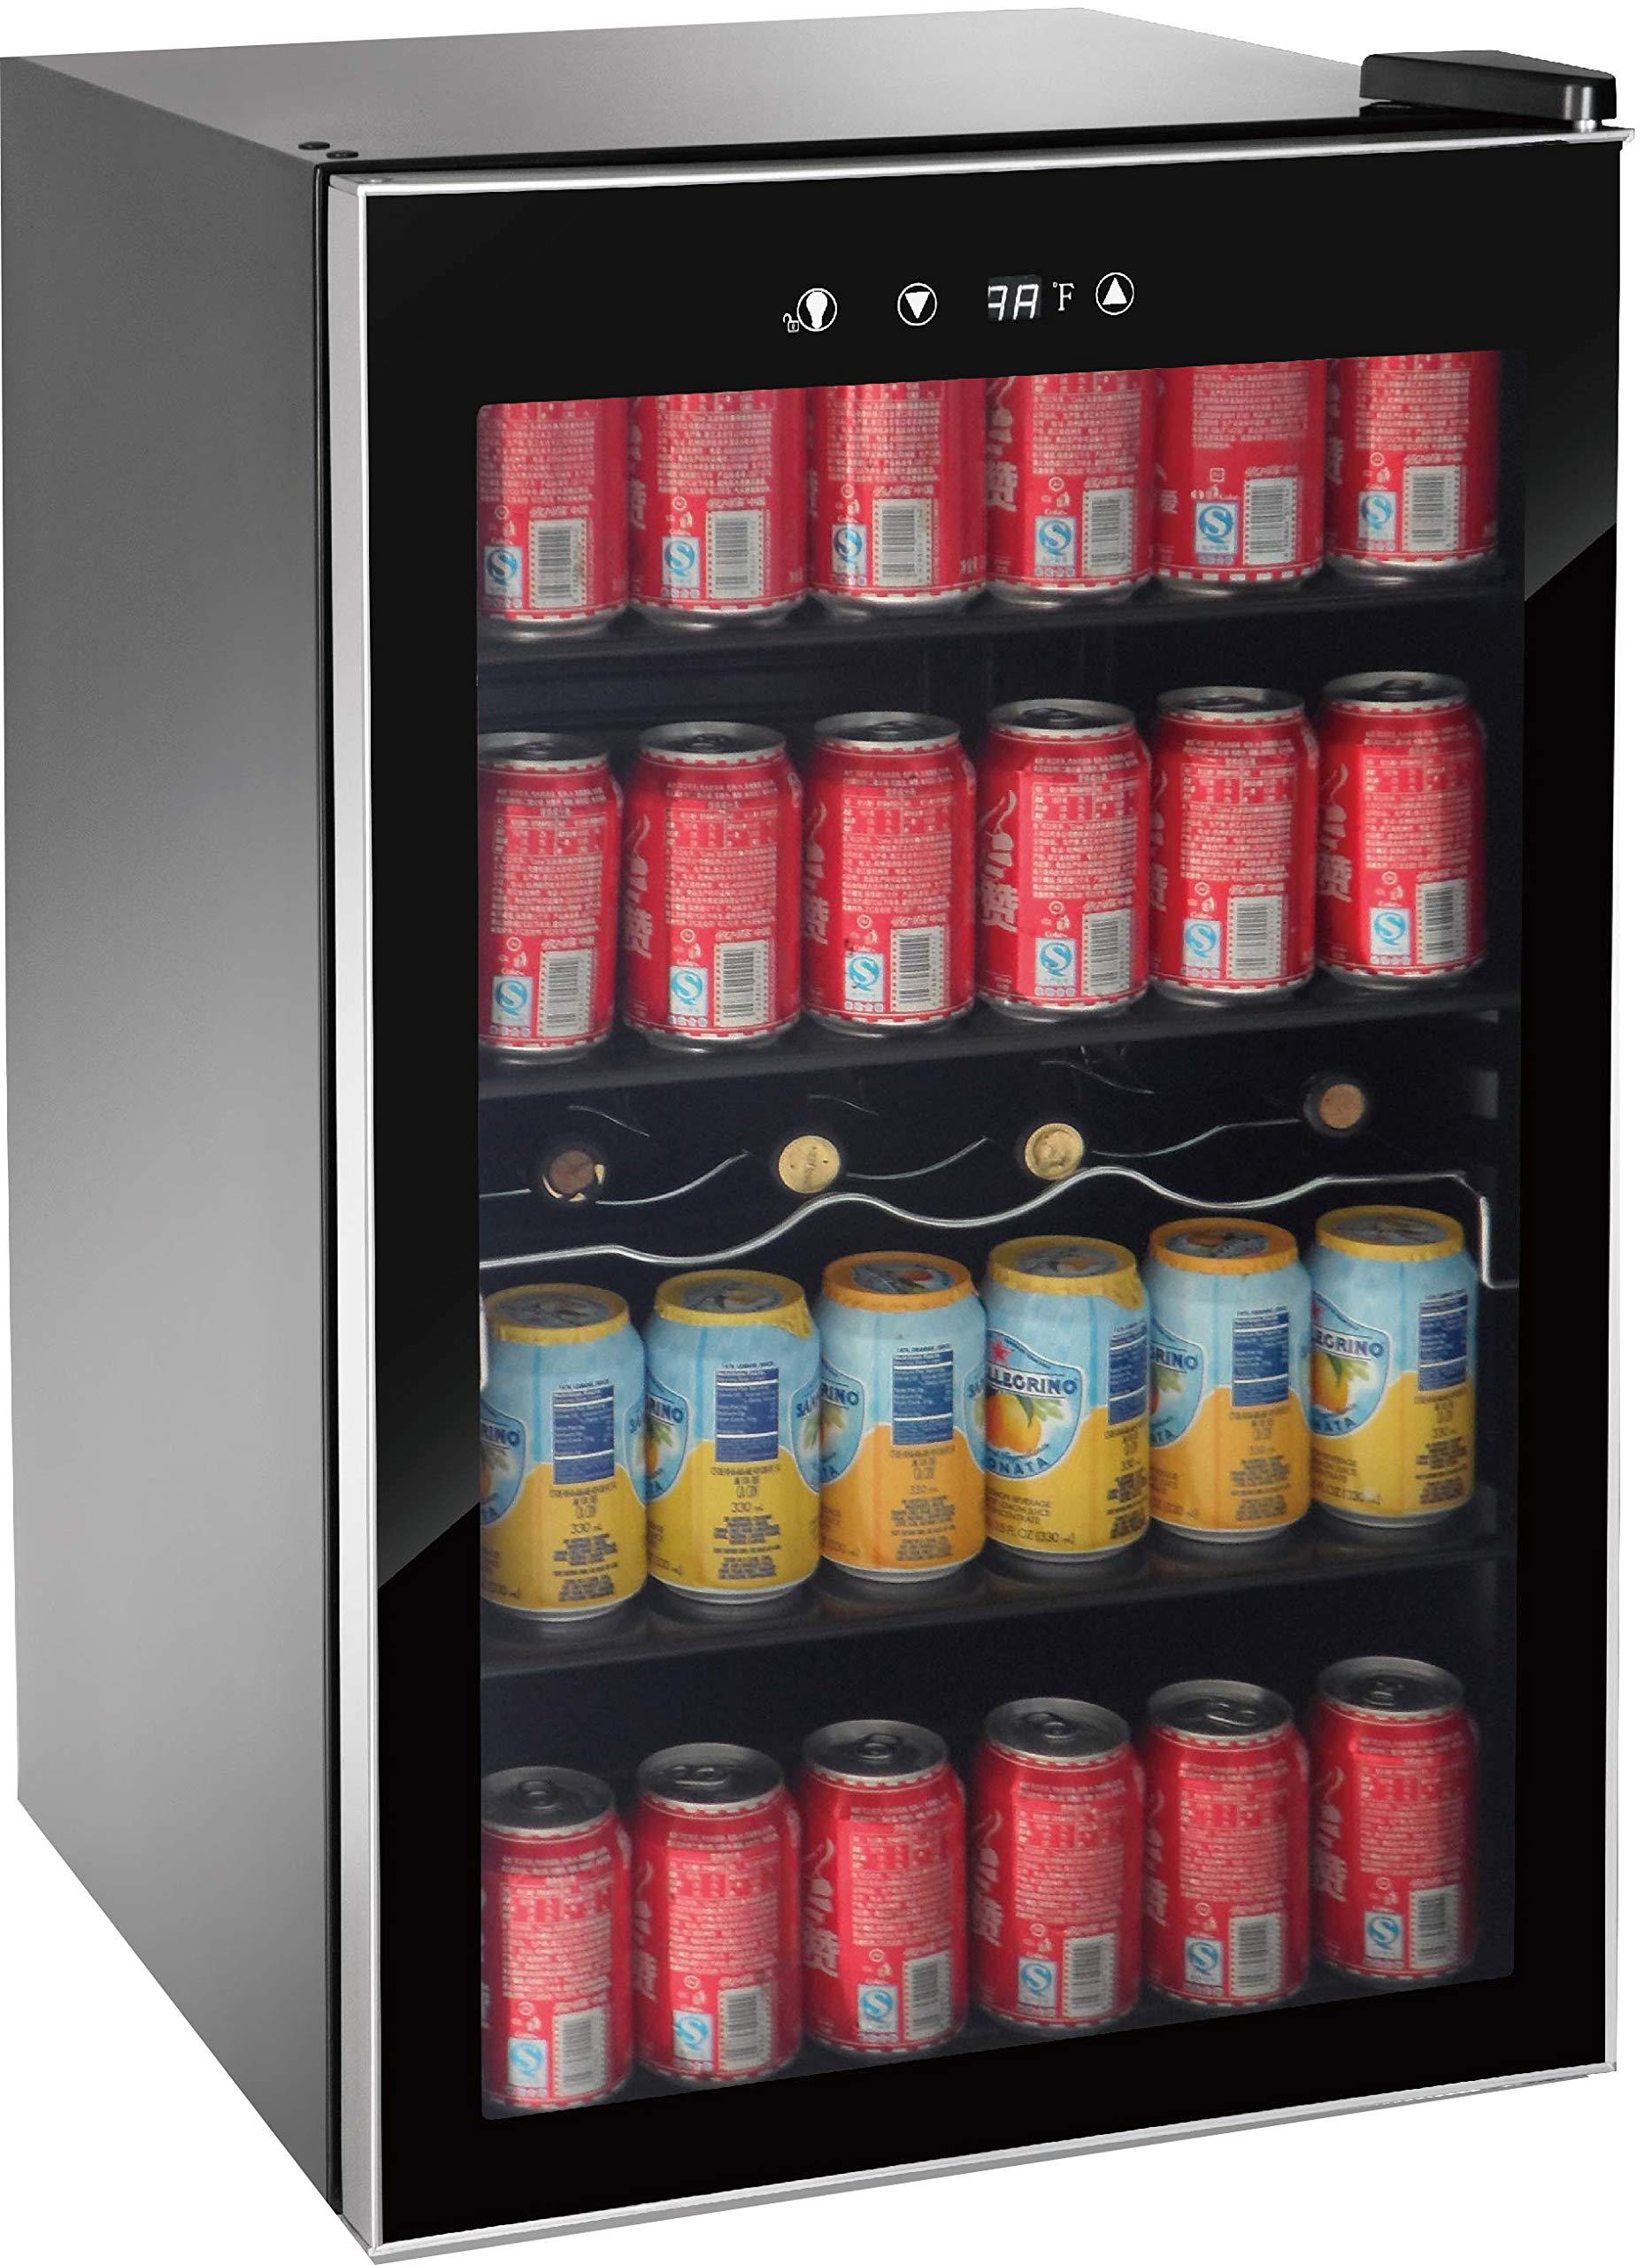 RCA wine cooler fridge beverage cooler (110 can or 36 bottles) by RCA